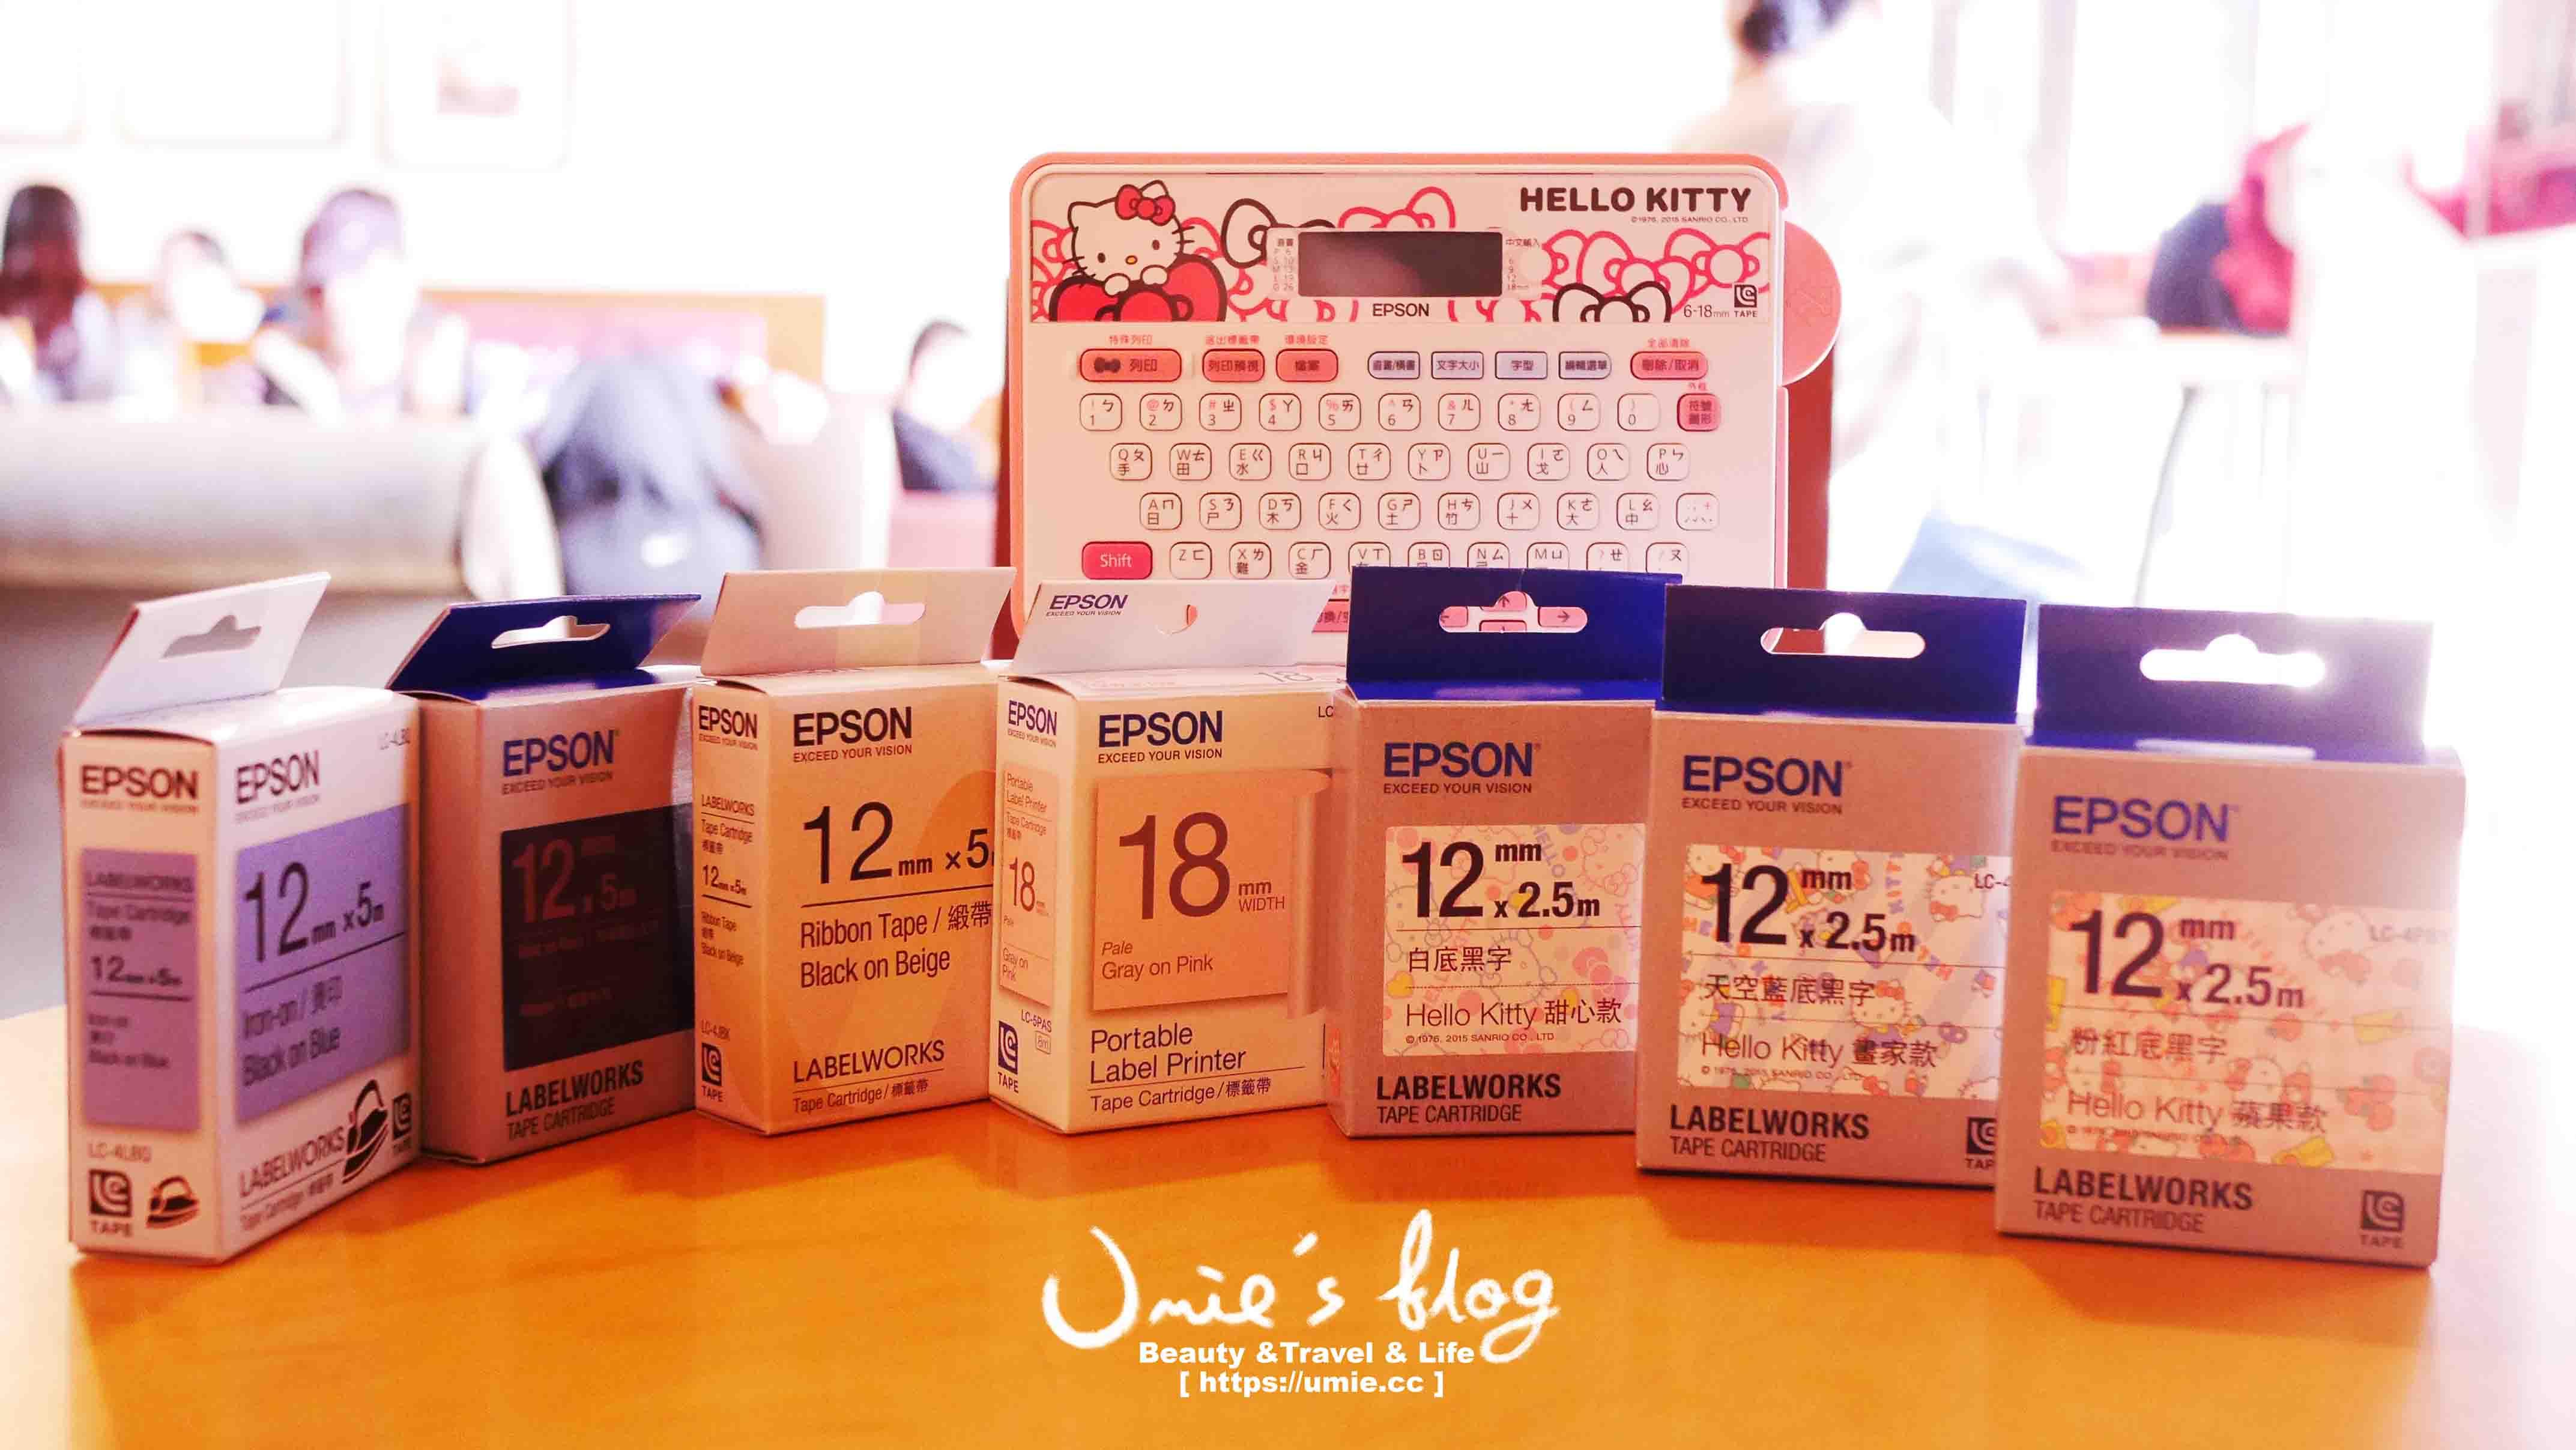 Xmas 禮物推薦!EPSON- Hello Kitty 限定版標籤機!可愛又實用 :D 實體應用篇!